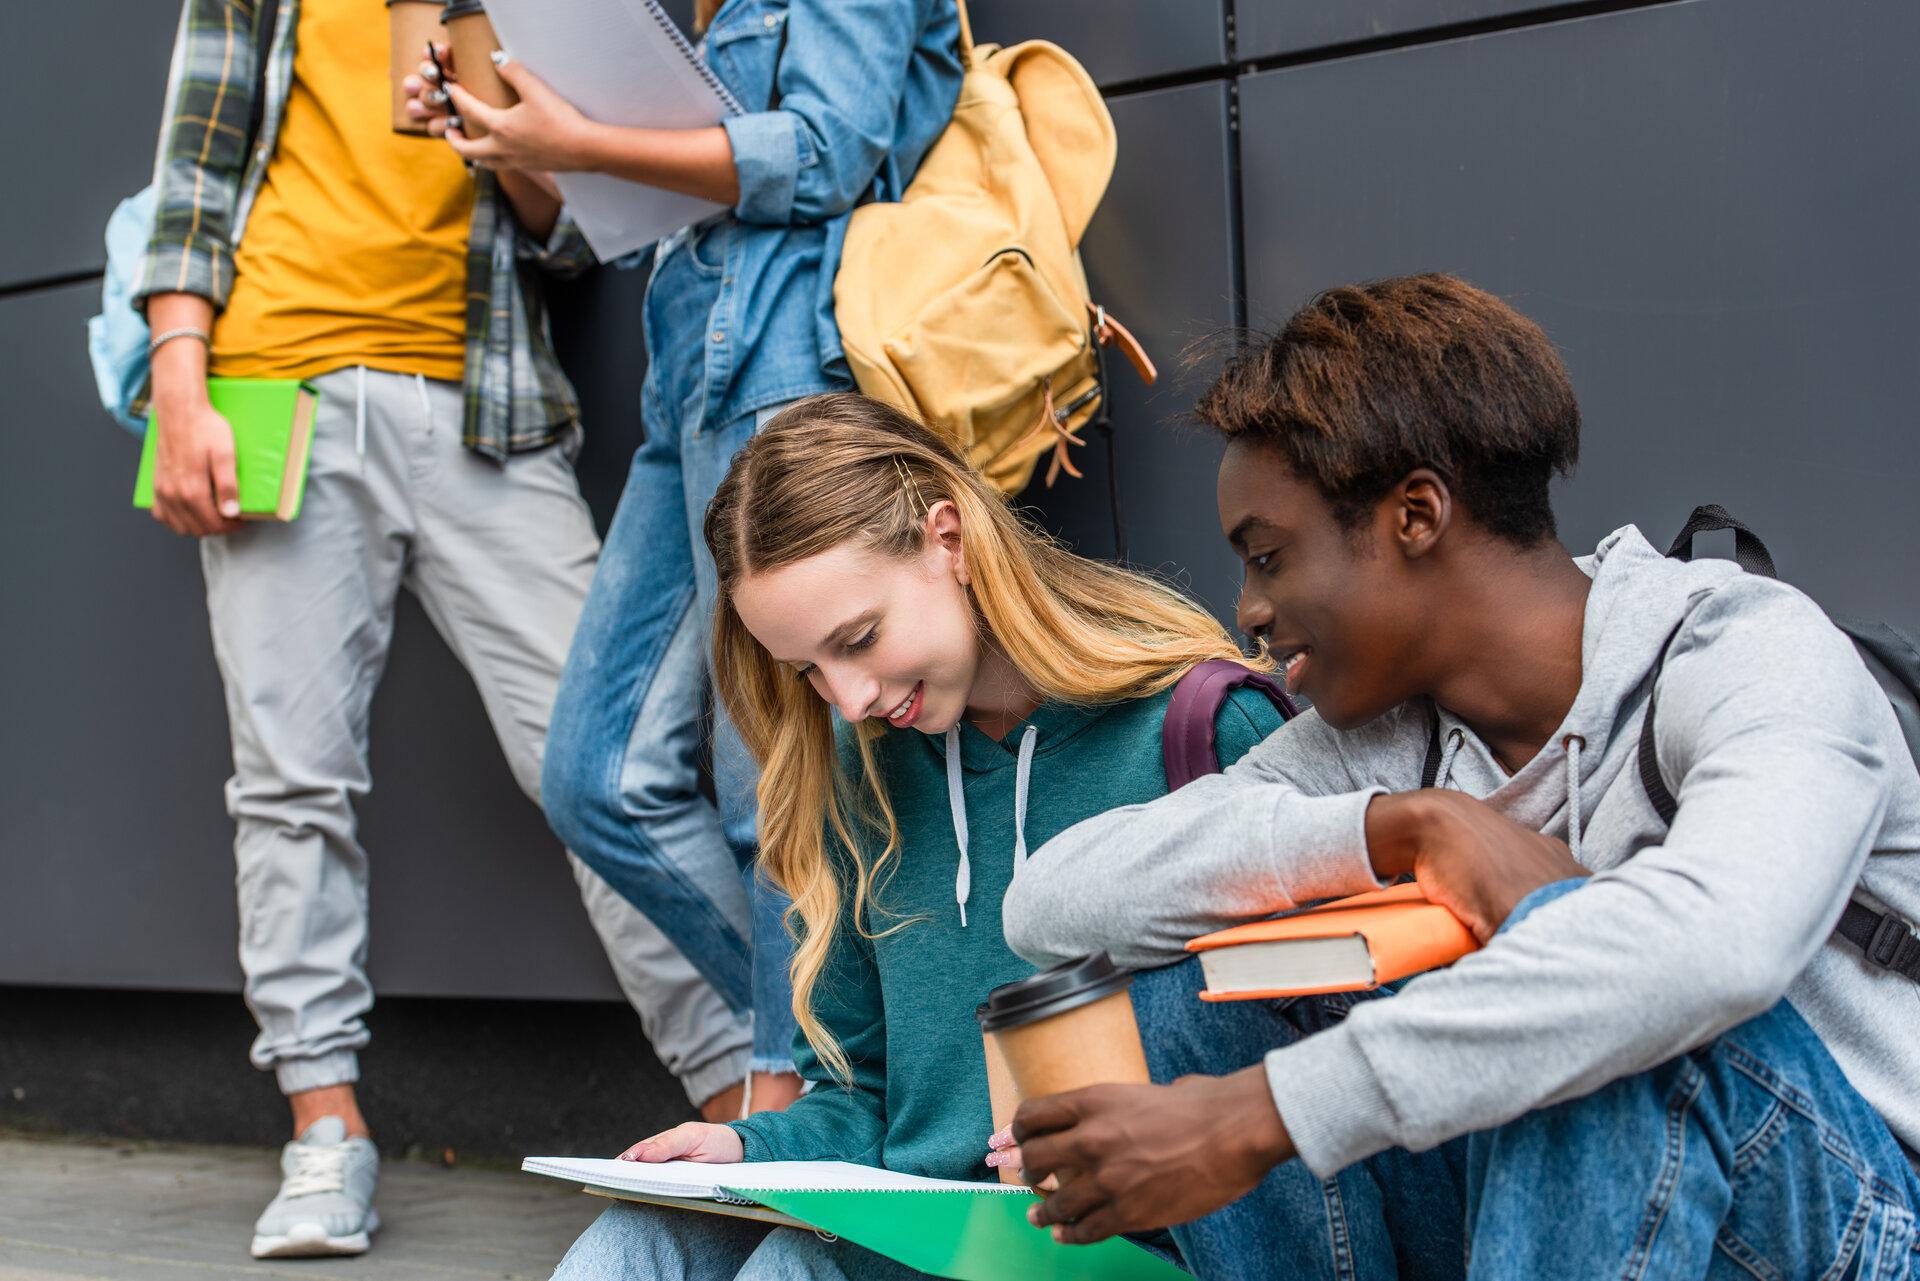 Vielfalt bei jungen Menschen